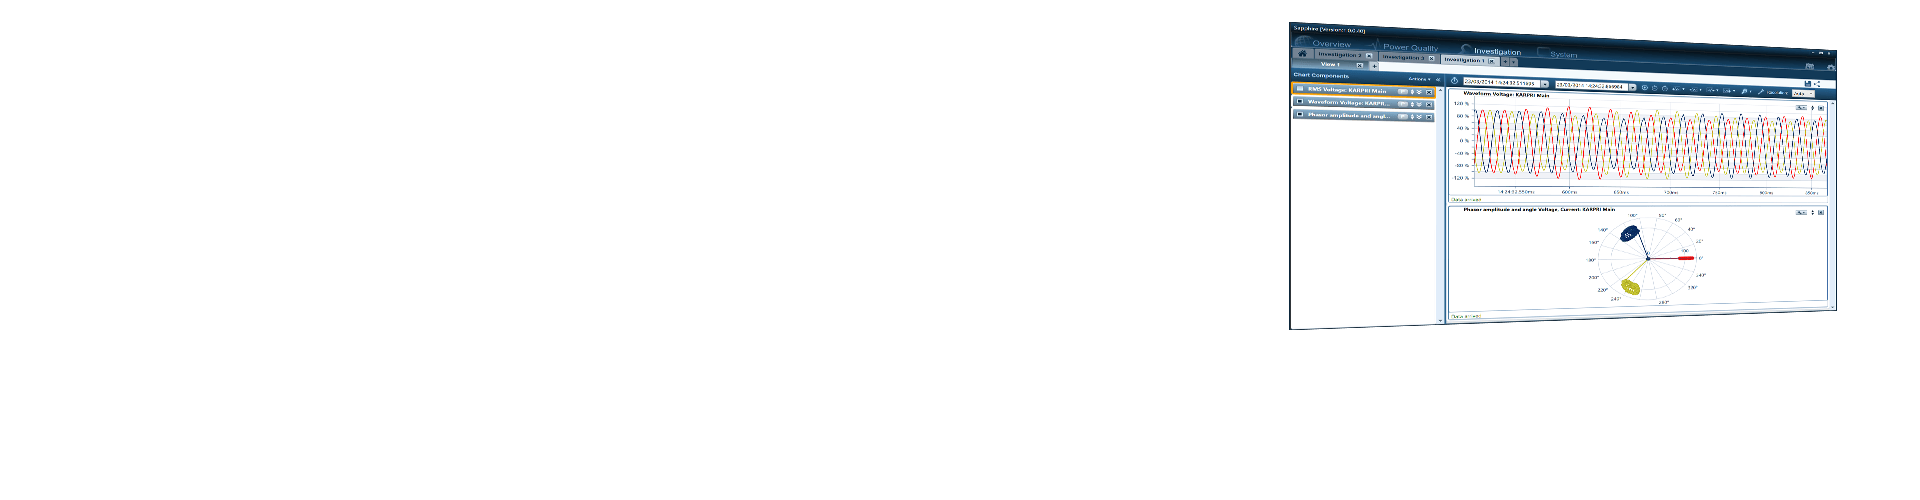 pqscada screen display